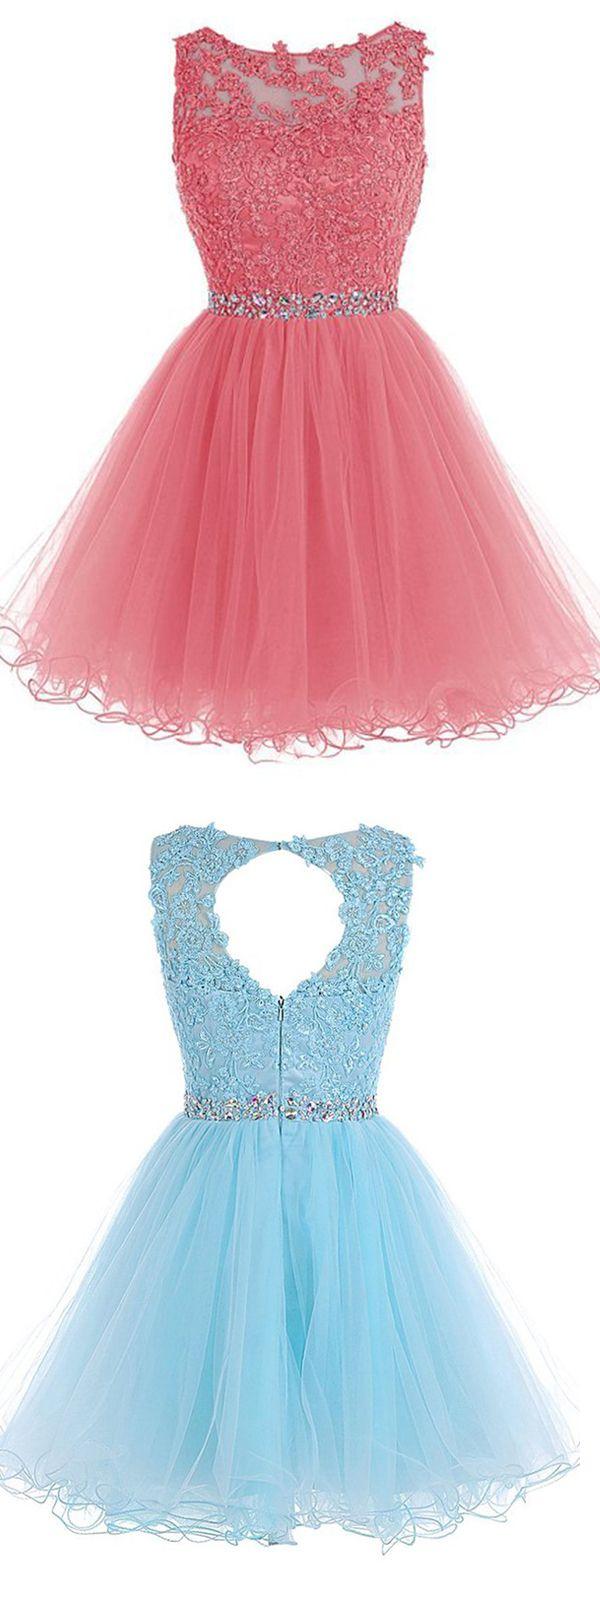 Scoop Short Blue Zipper-up Tulle Homecoming Dress